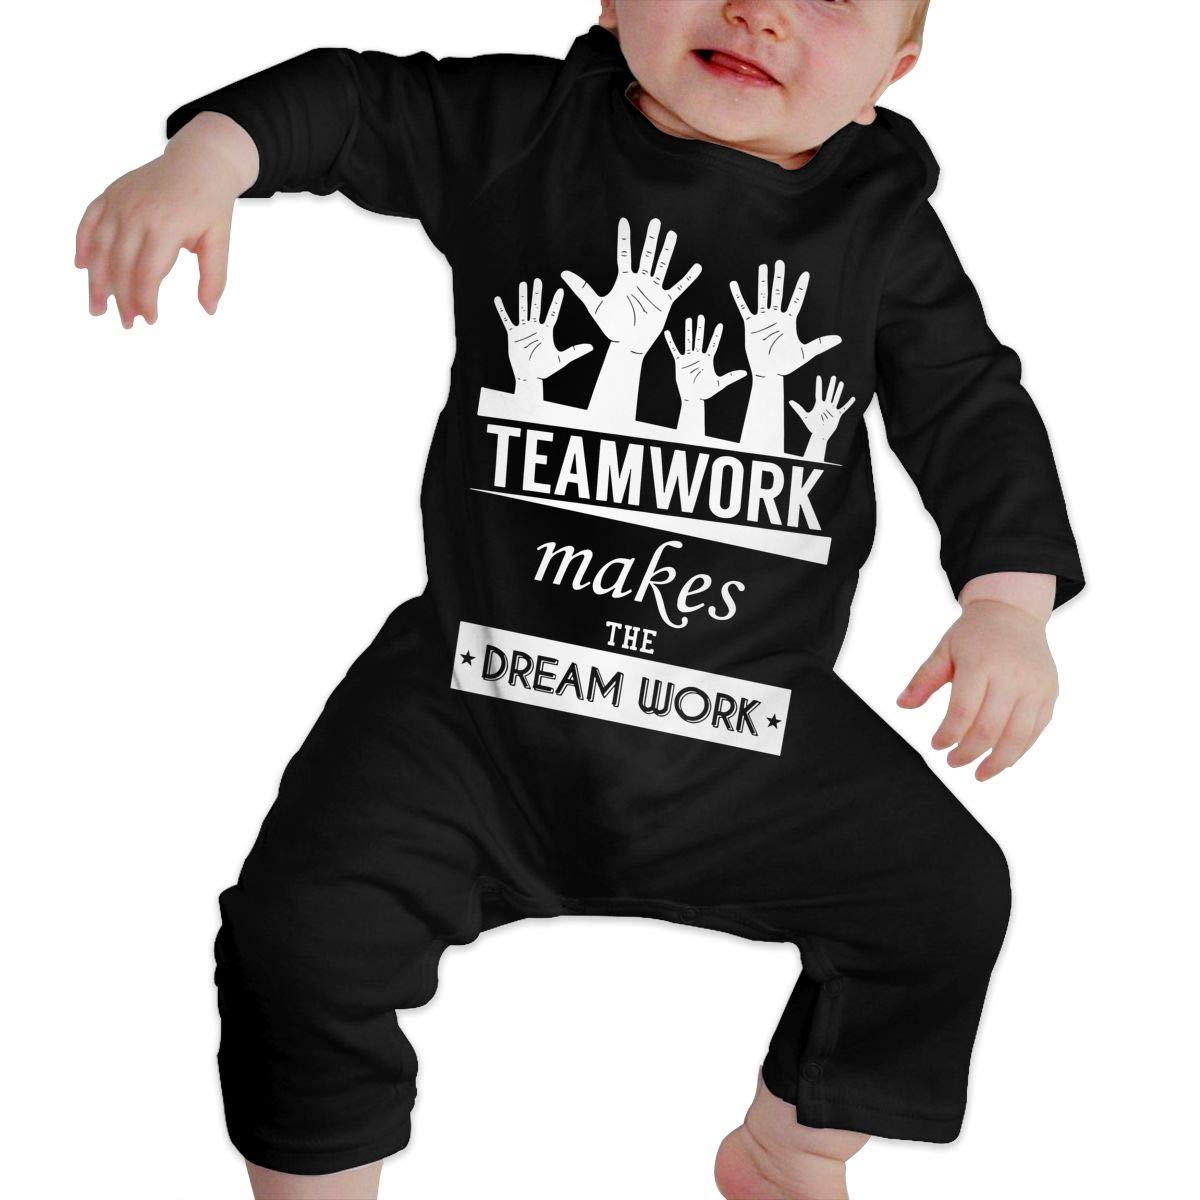 U99oi-9 Long Sleeve Cotton Bodysuit for Baby Boys and Girls Soft Teamwork Makes Dream Work Sleepwear